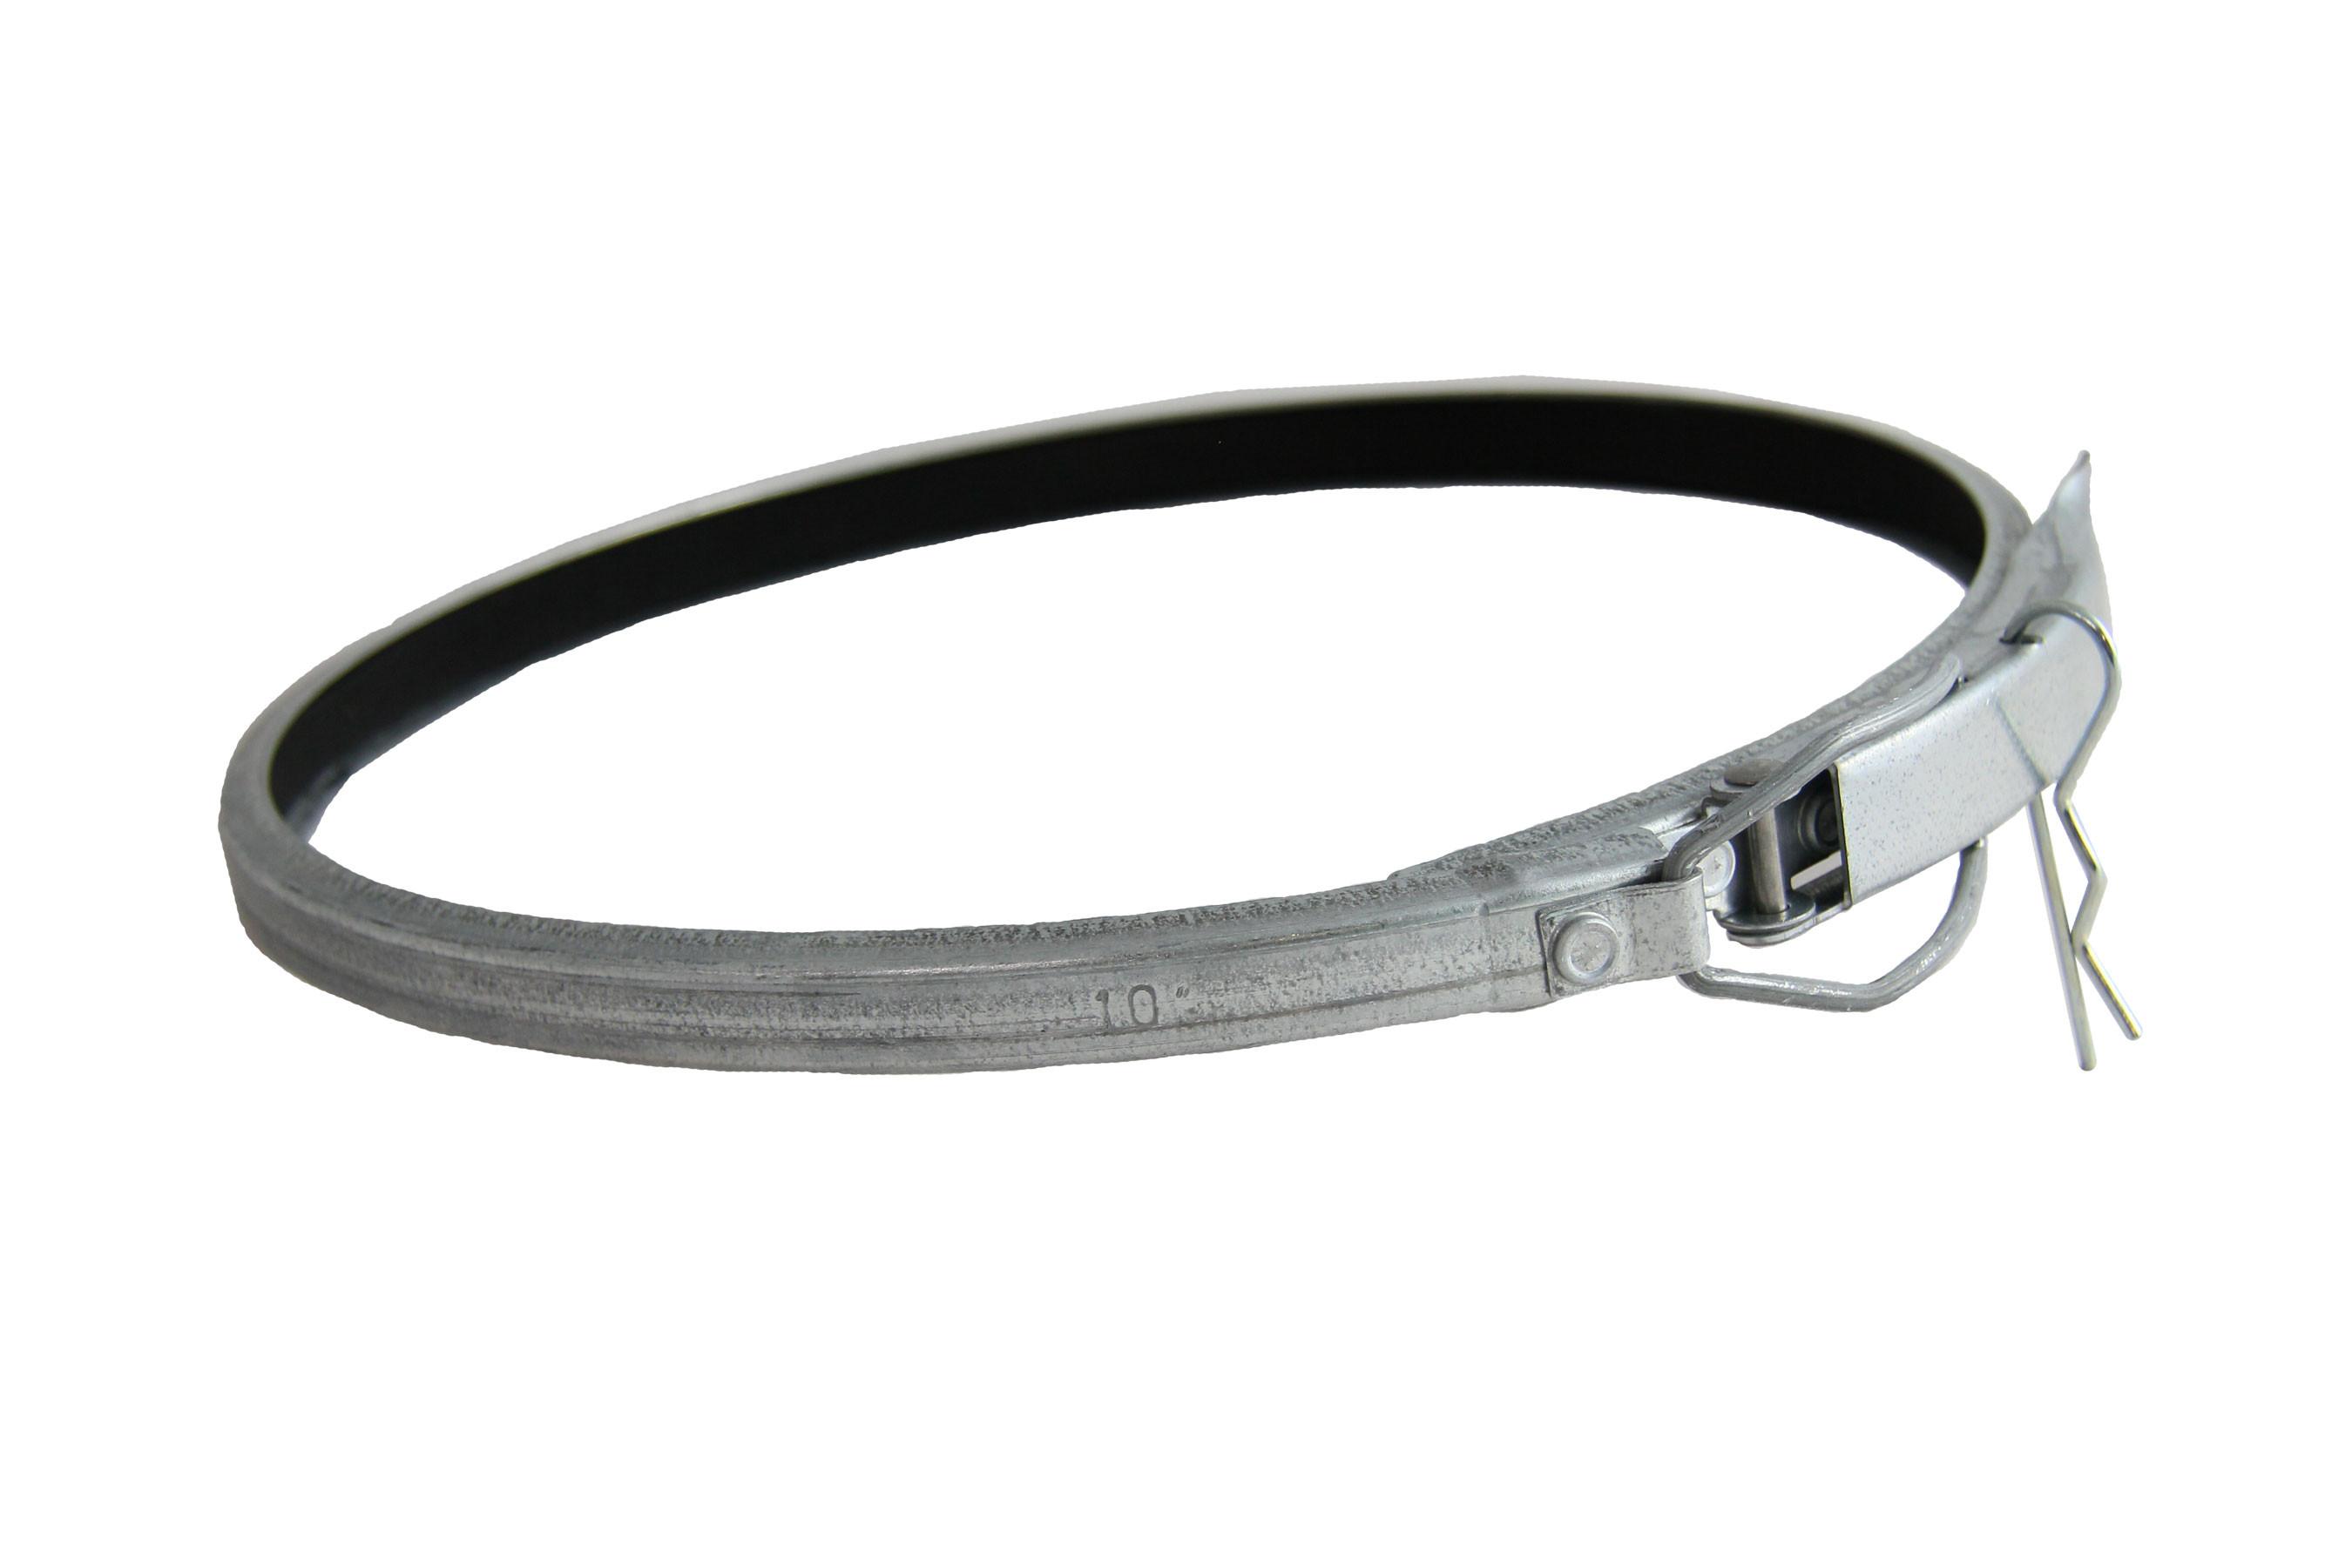 Rohrschelle NW 355 AERO-050